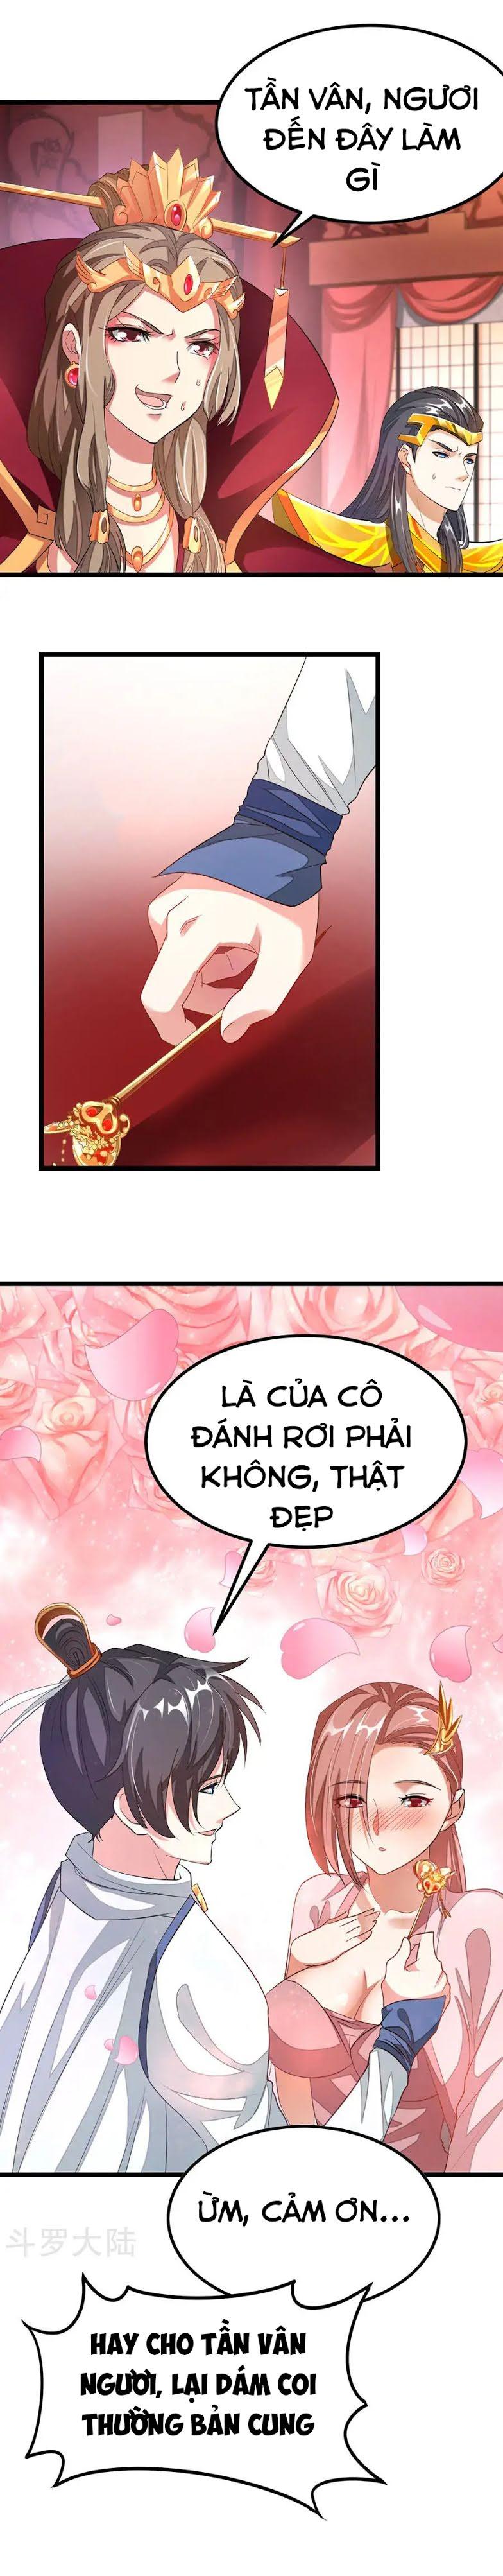 Cửu Dương Thần Vương Chapter 101 video - Hamtruyen.vn